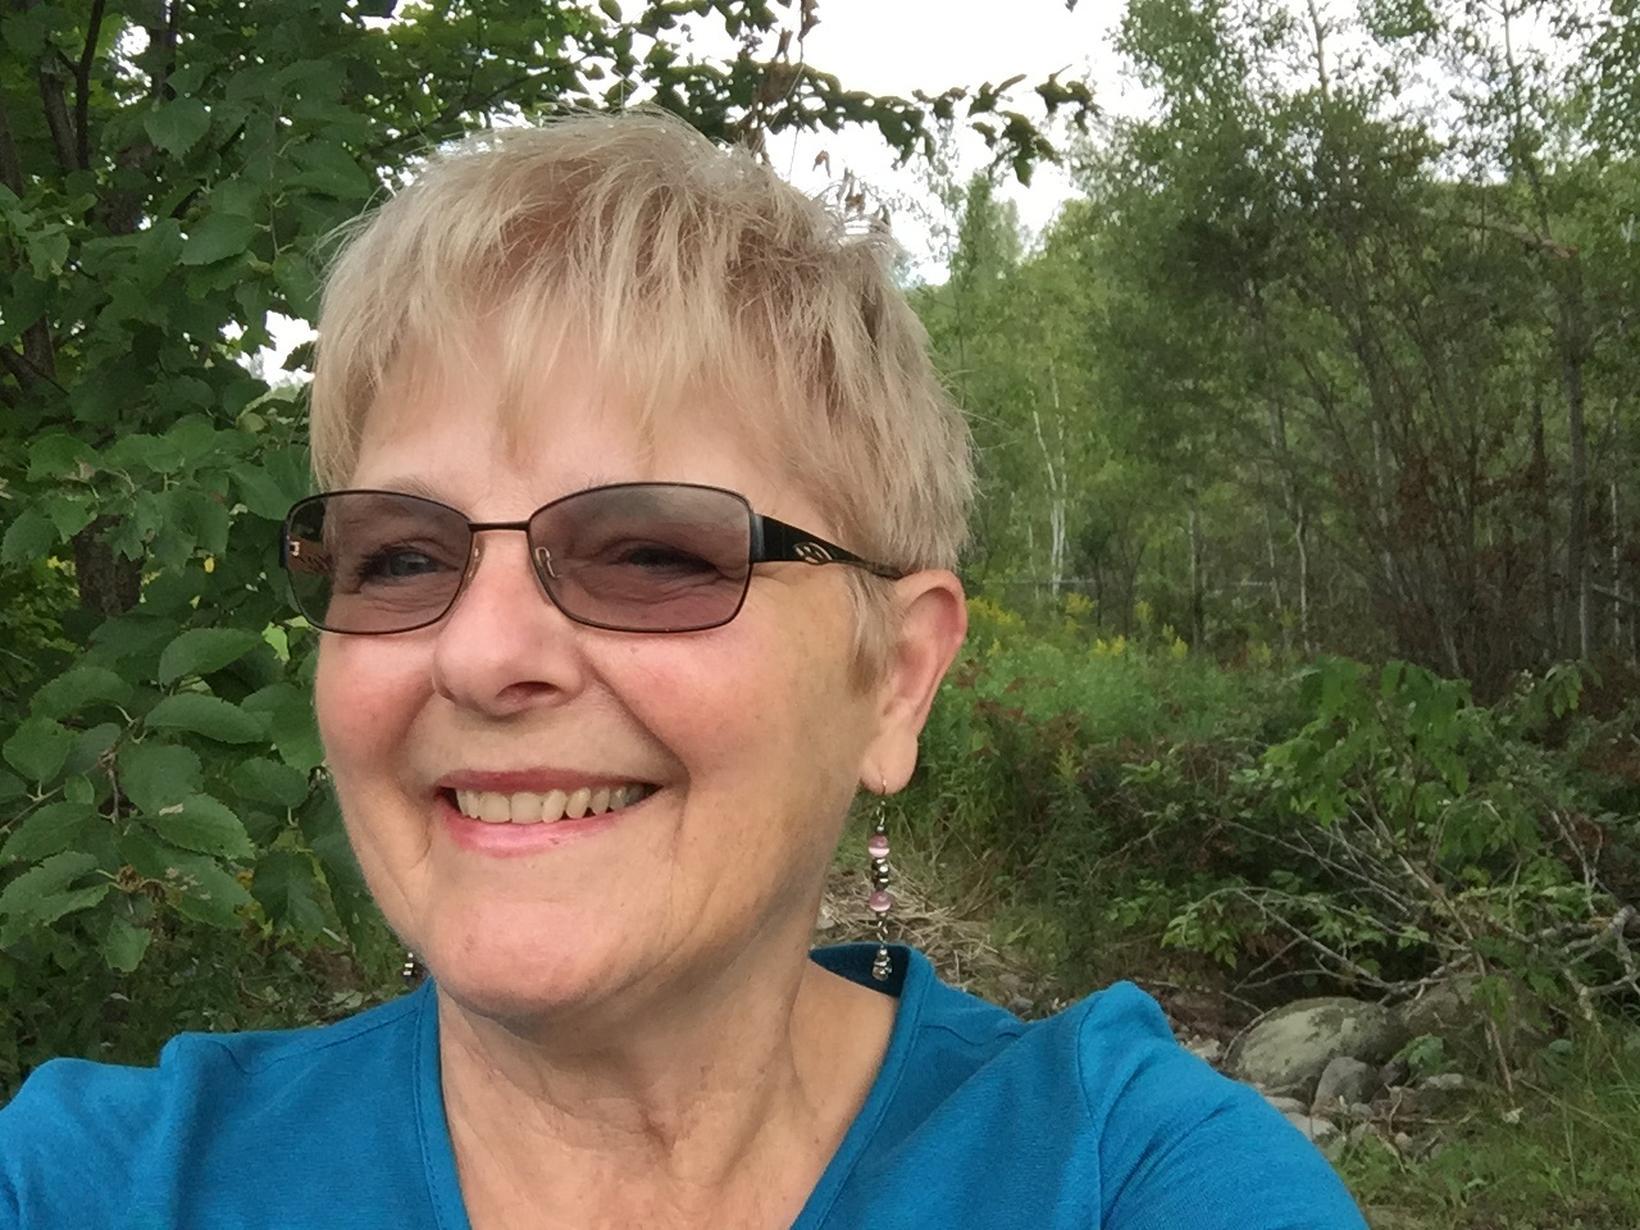 Shelley from Elliot Lake, Ontario, Canada